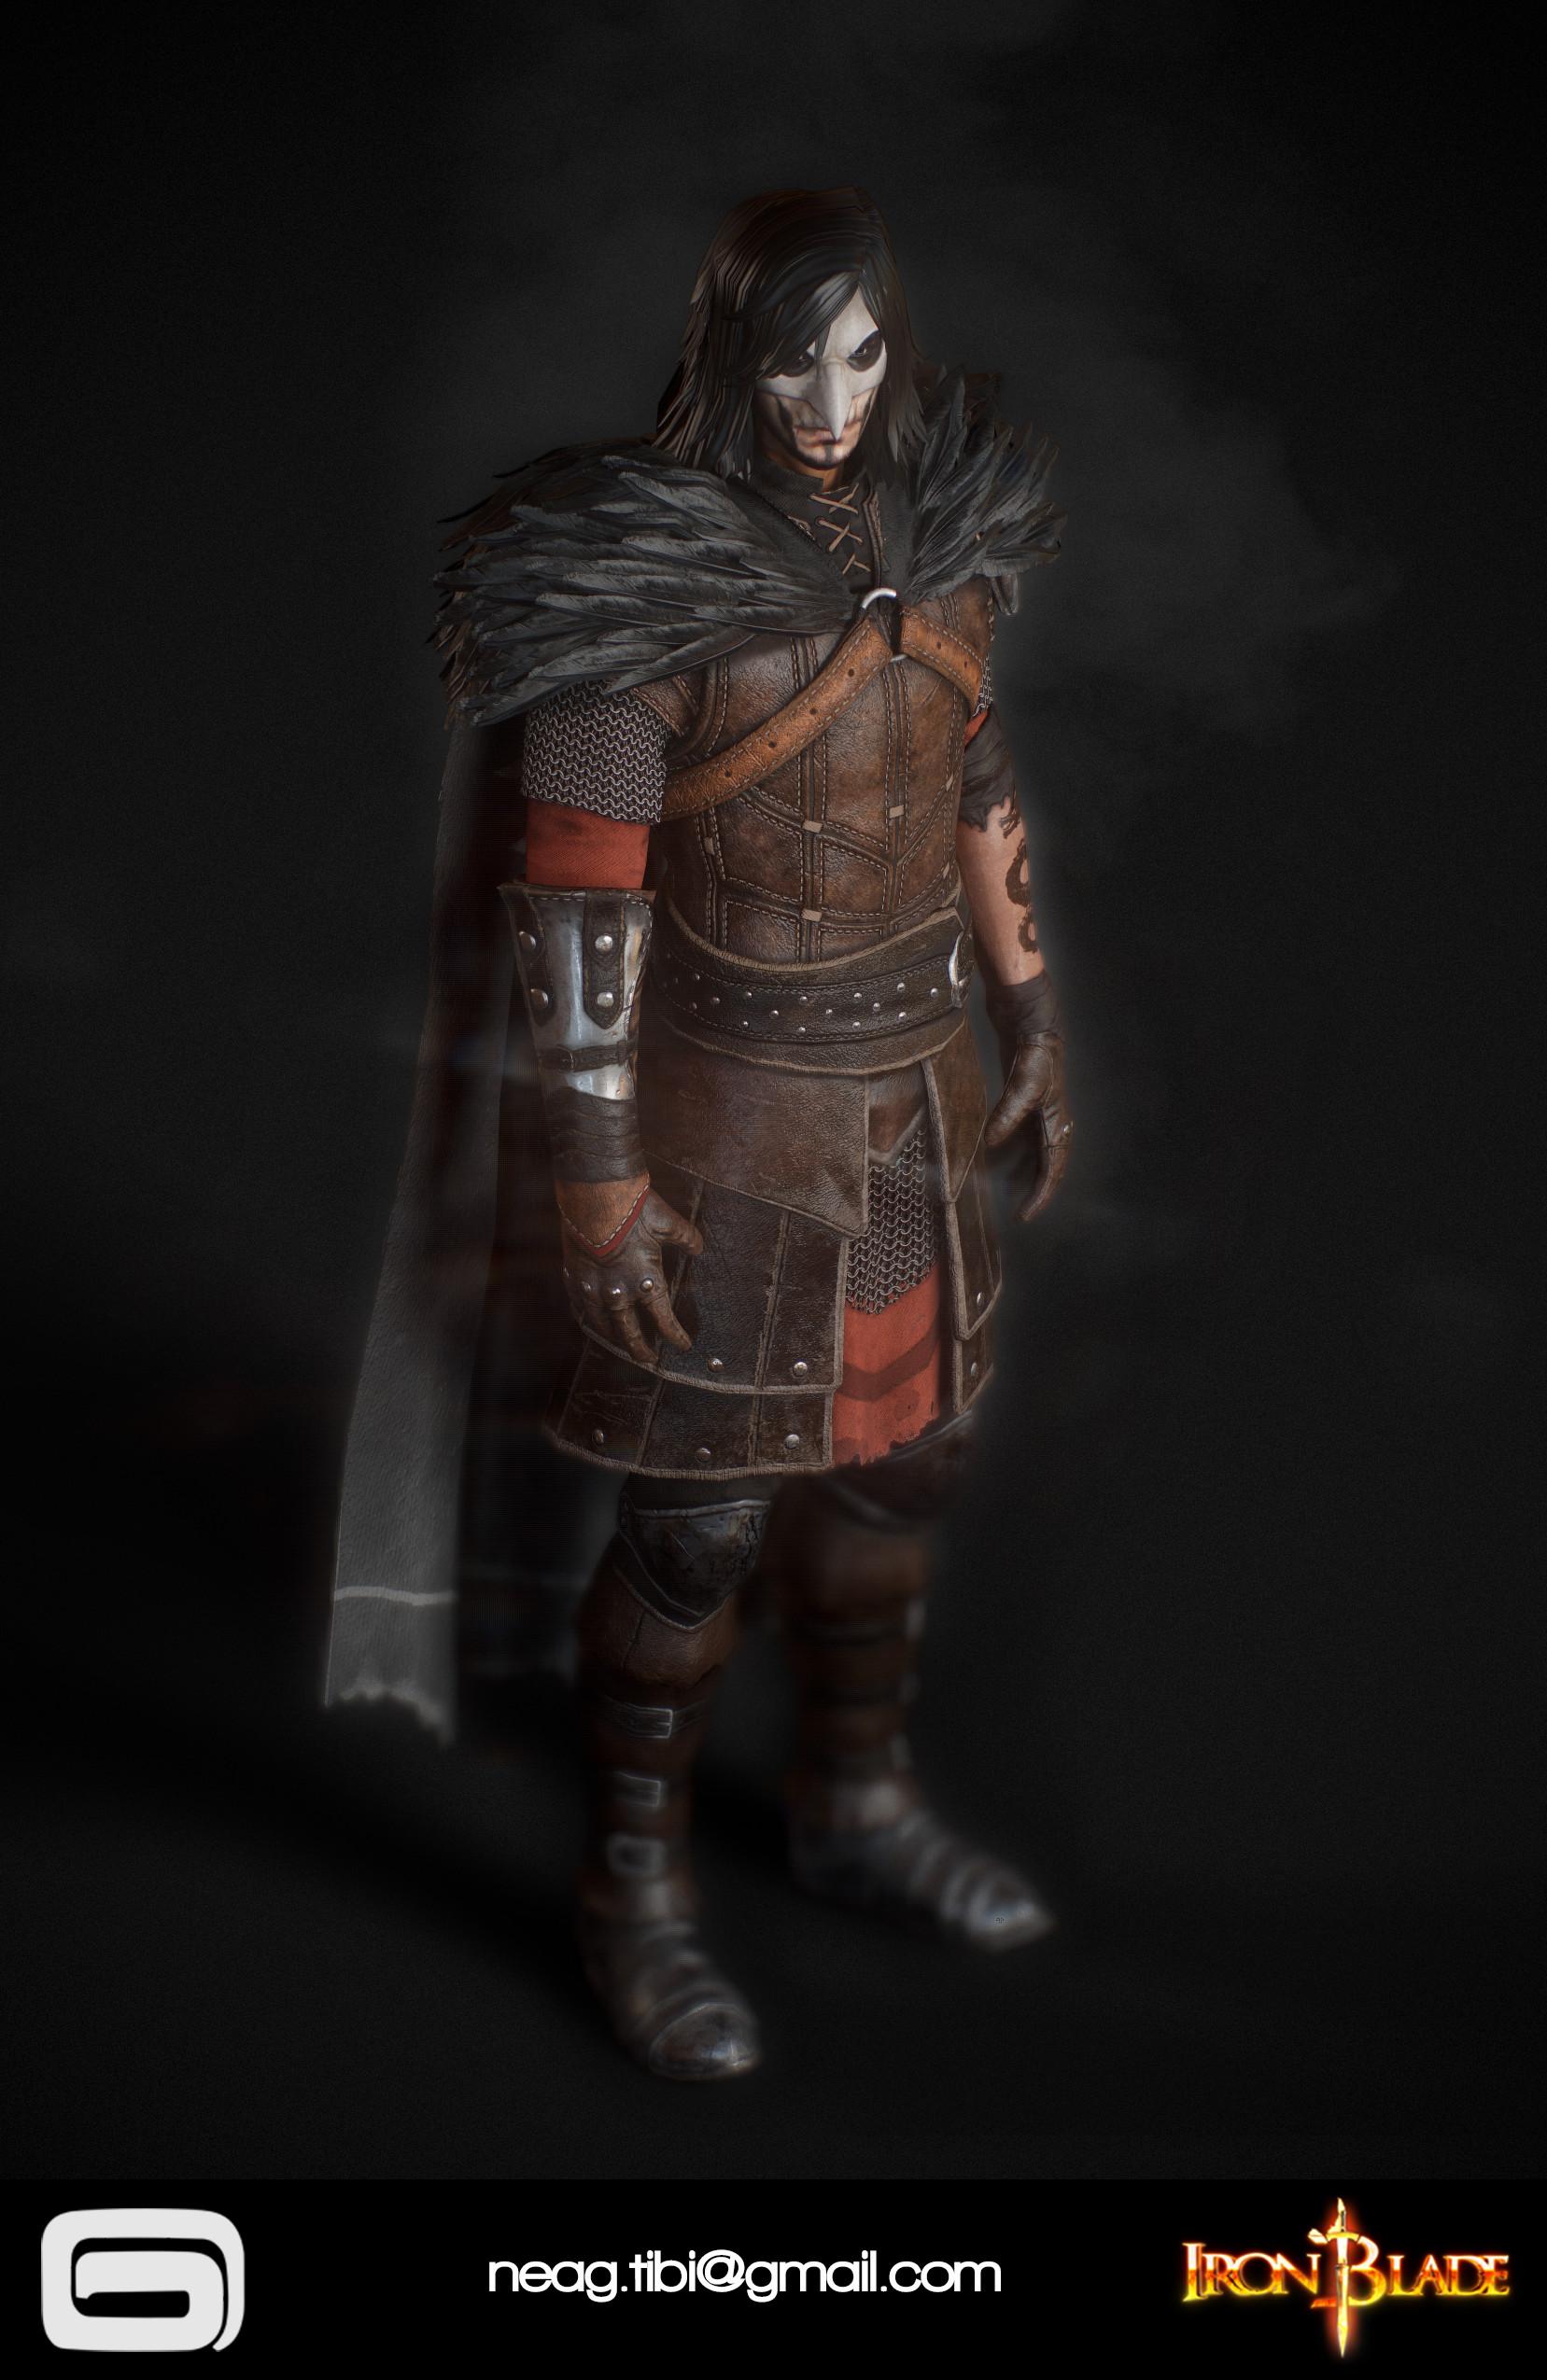 Tibi neag tibi neag iron blade mc armor 11b low poly 03